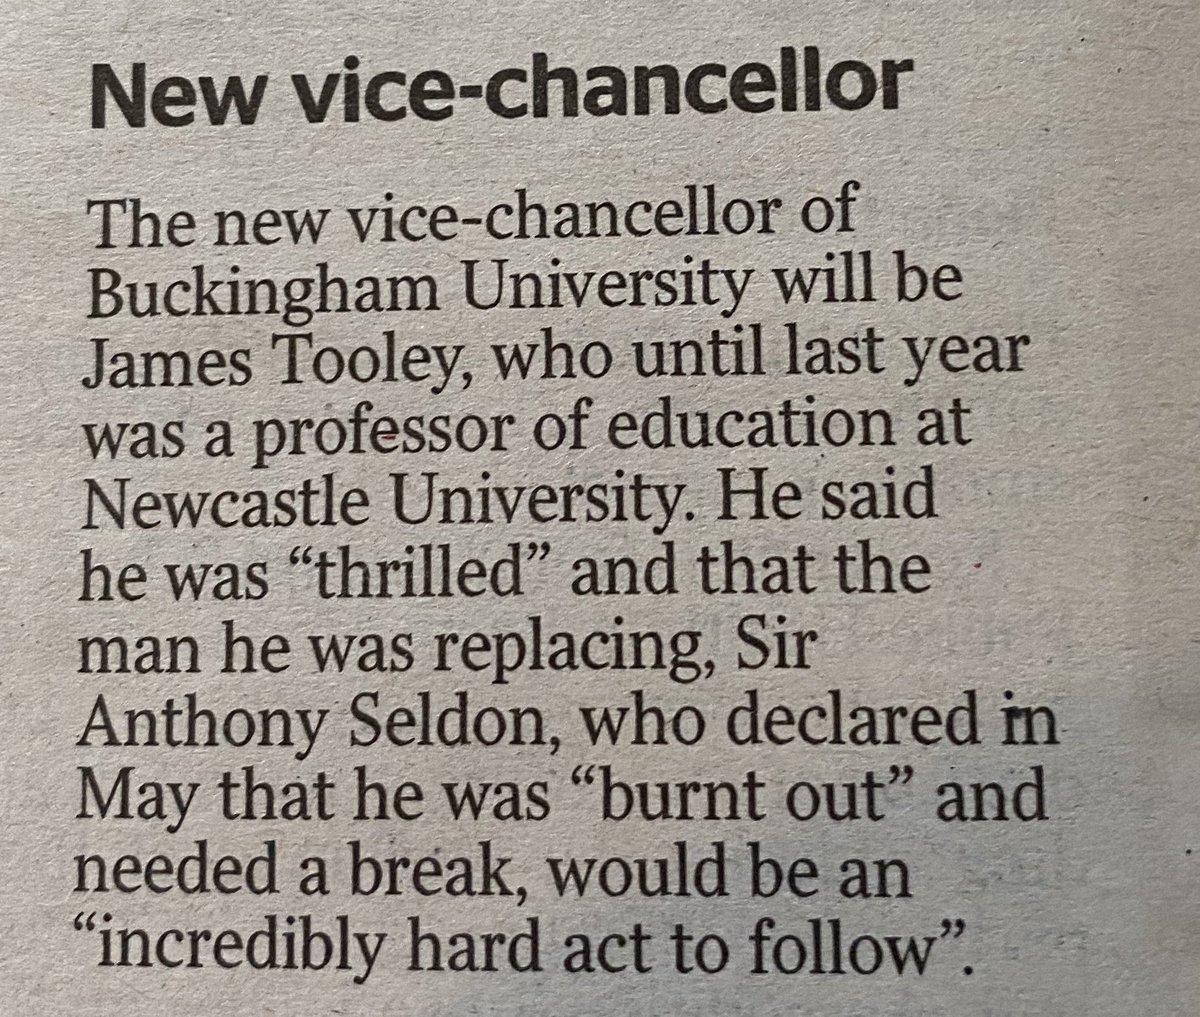 Great news for the University of Buckingham!